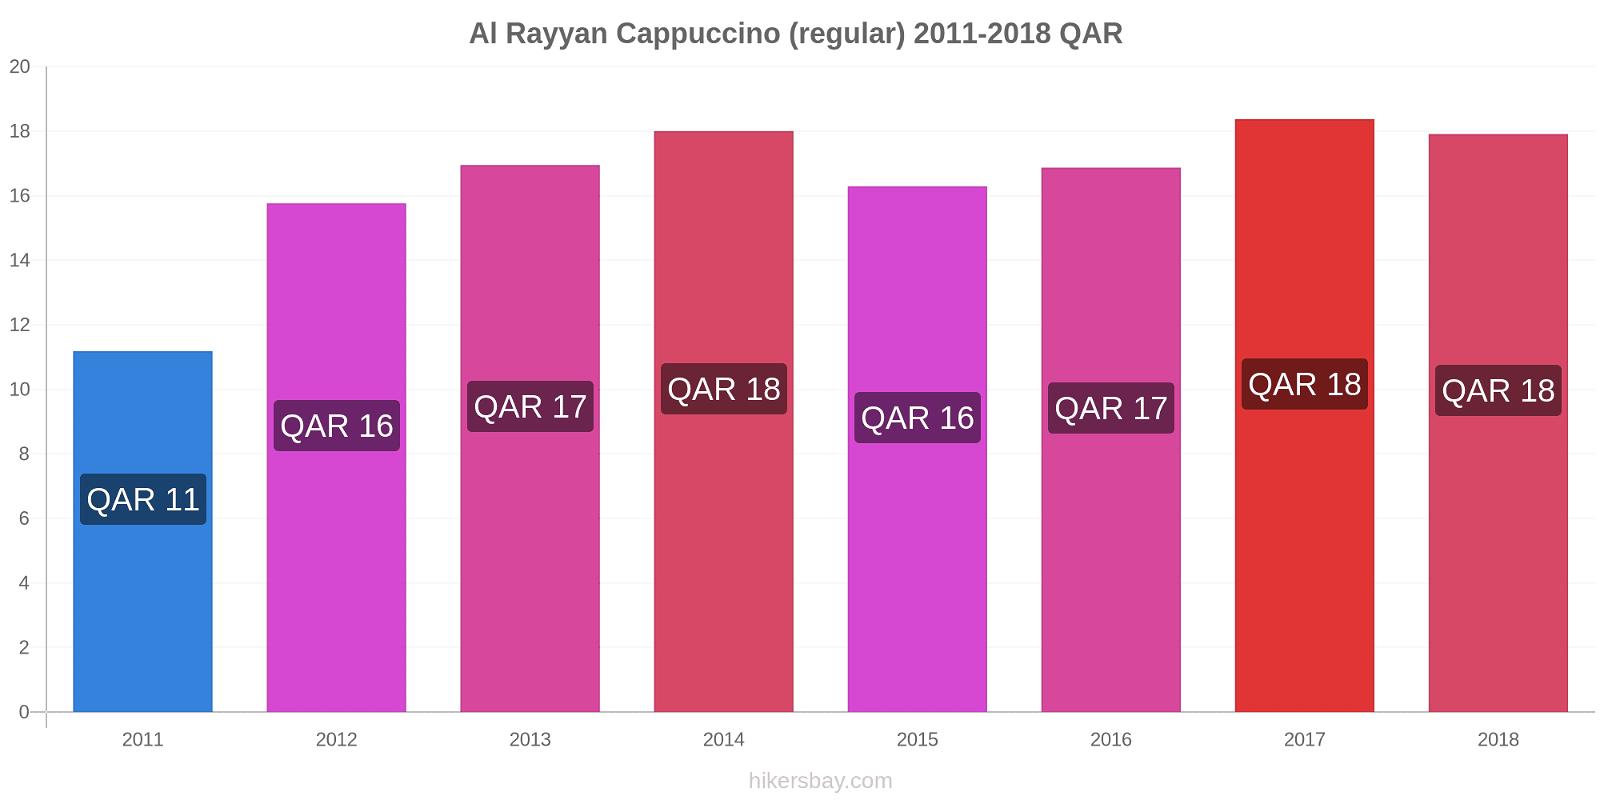 Al Rayyan price changes Cappuccino (regular) hikersbay.com